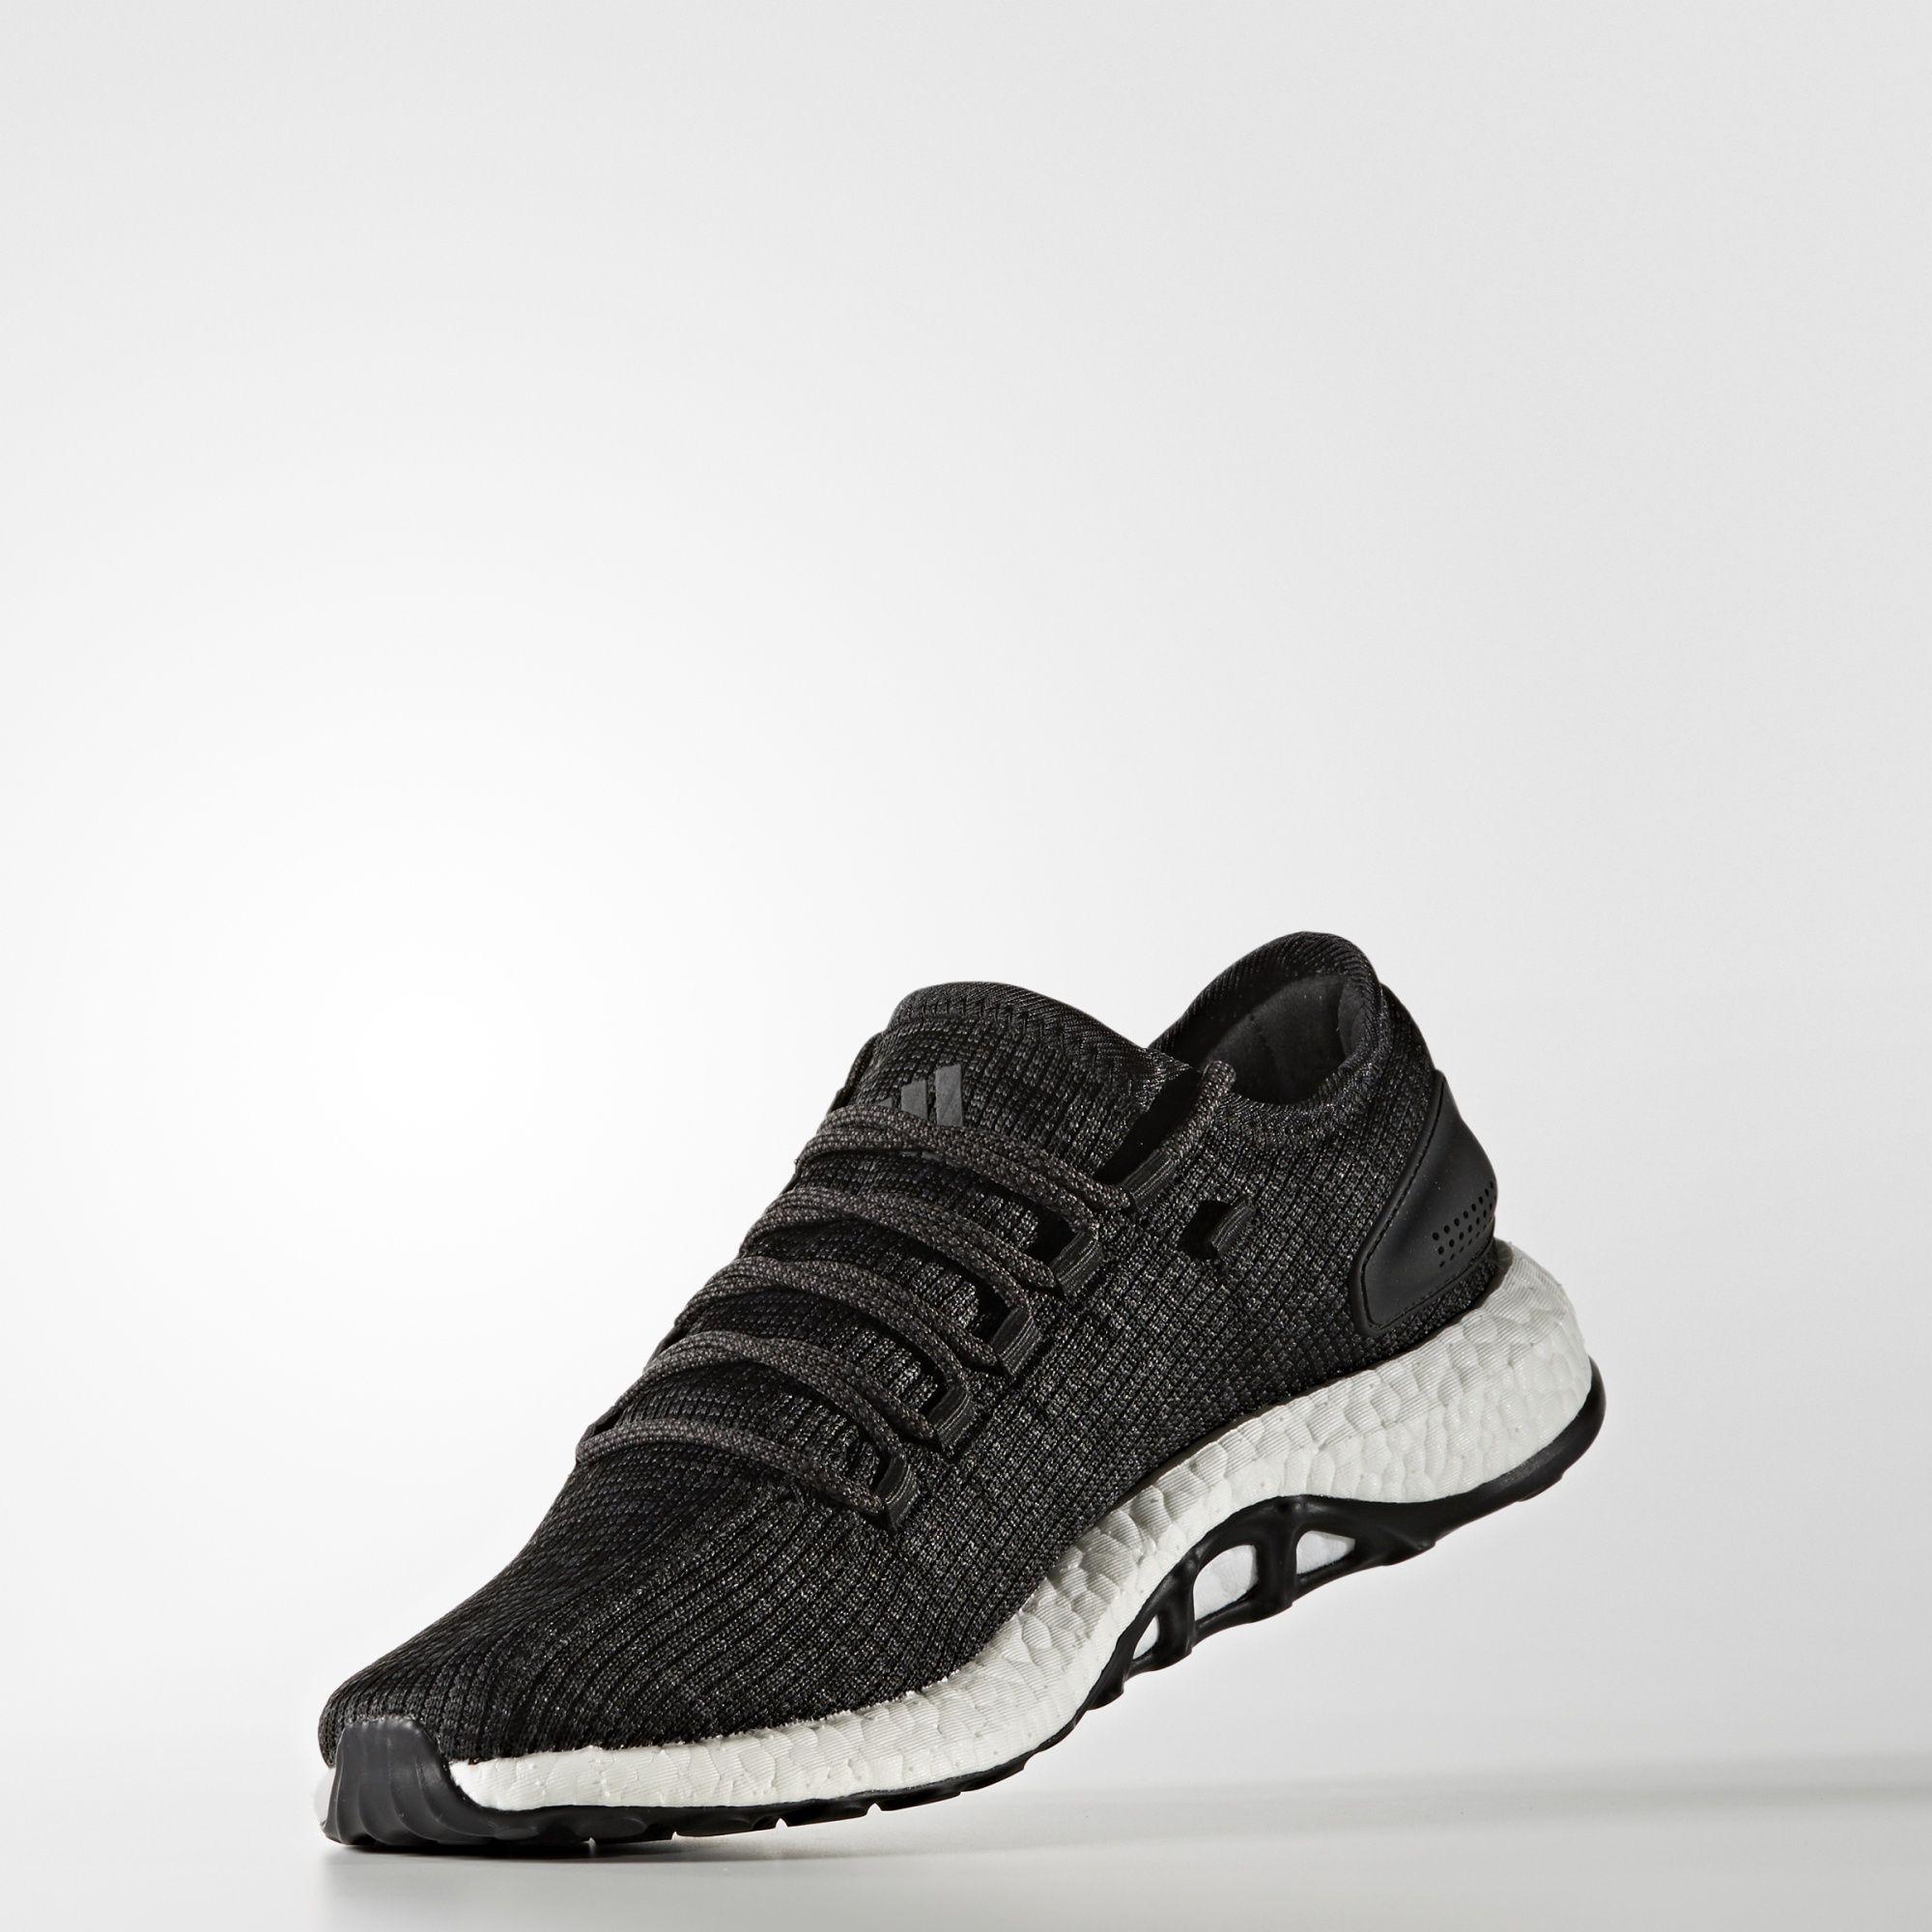 Adidas PureBOOST // Core Black